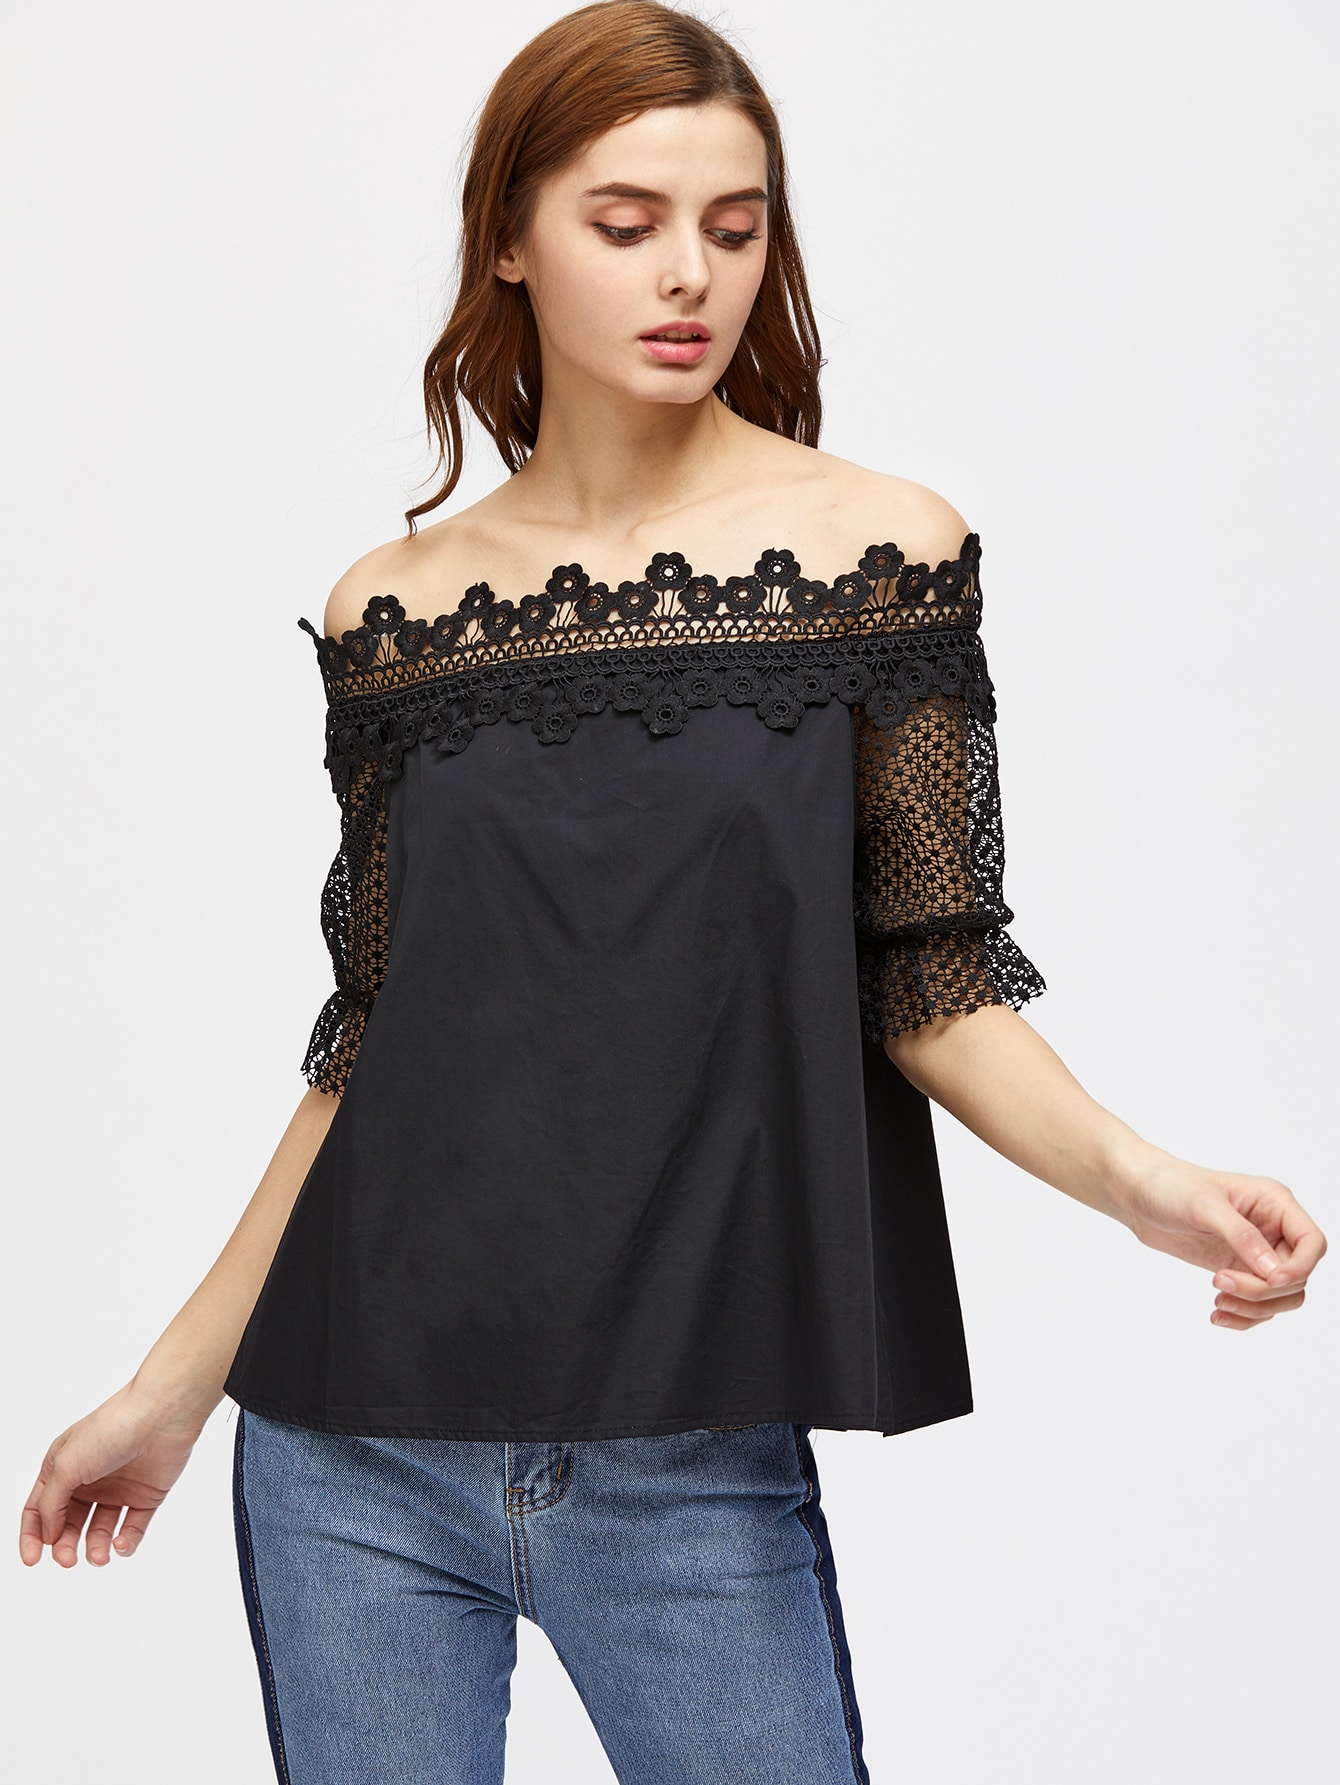 Crochet Bardot Neck And Sleeve Top blouse170422407